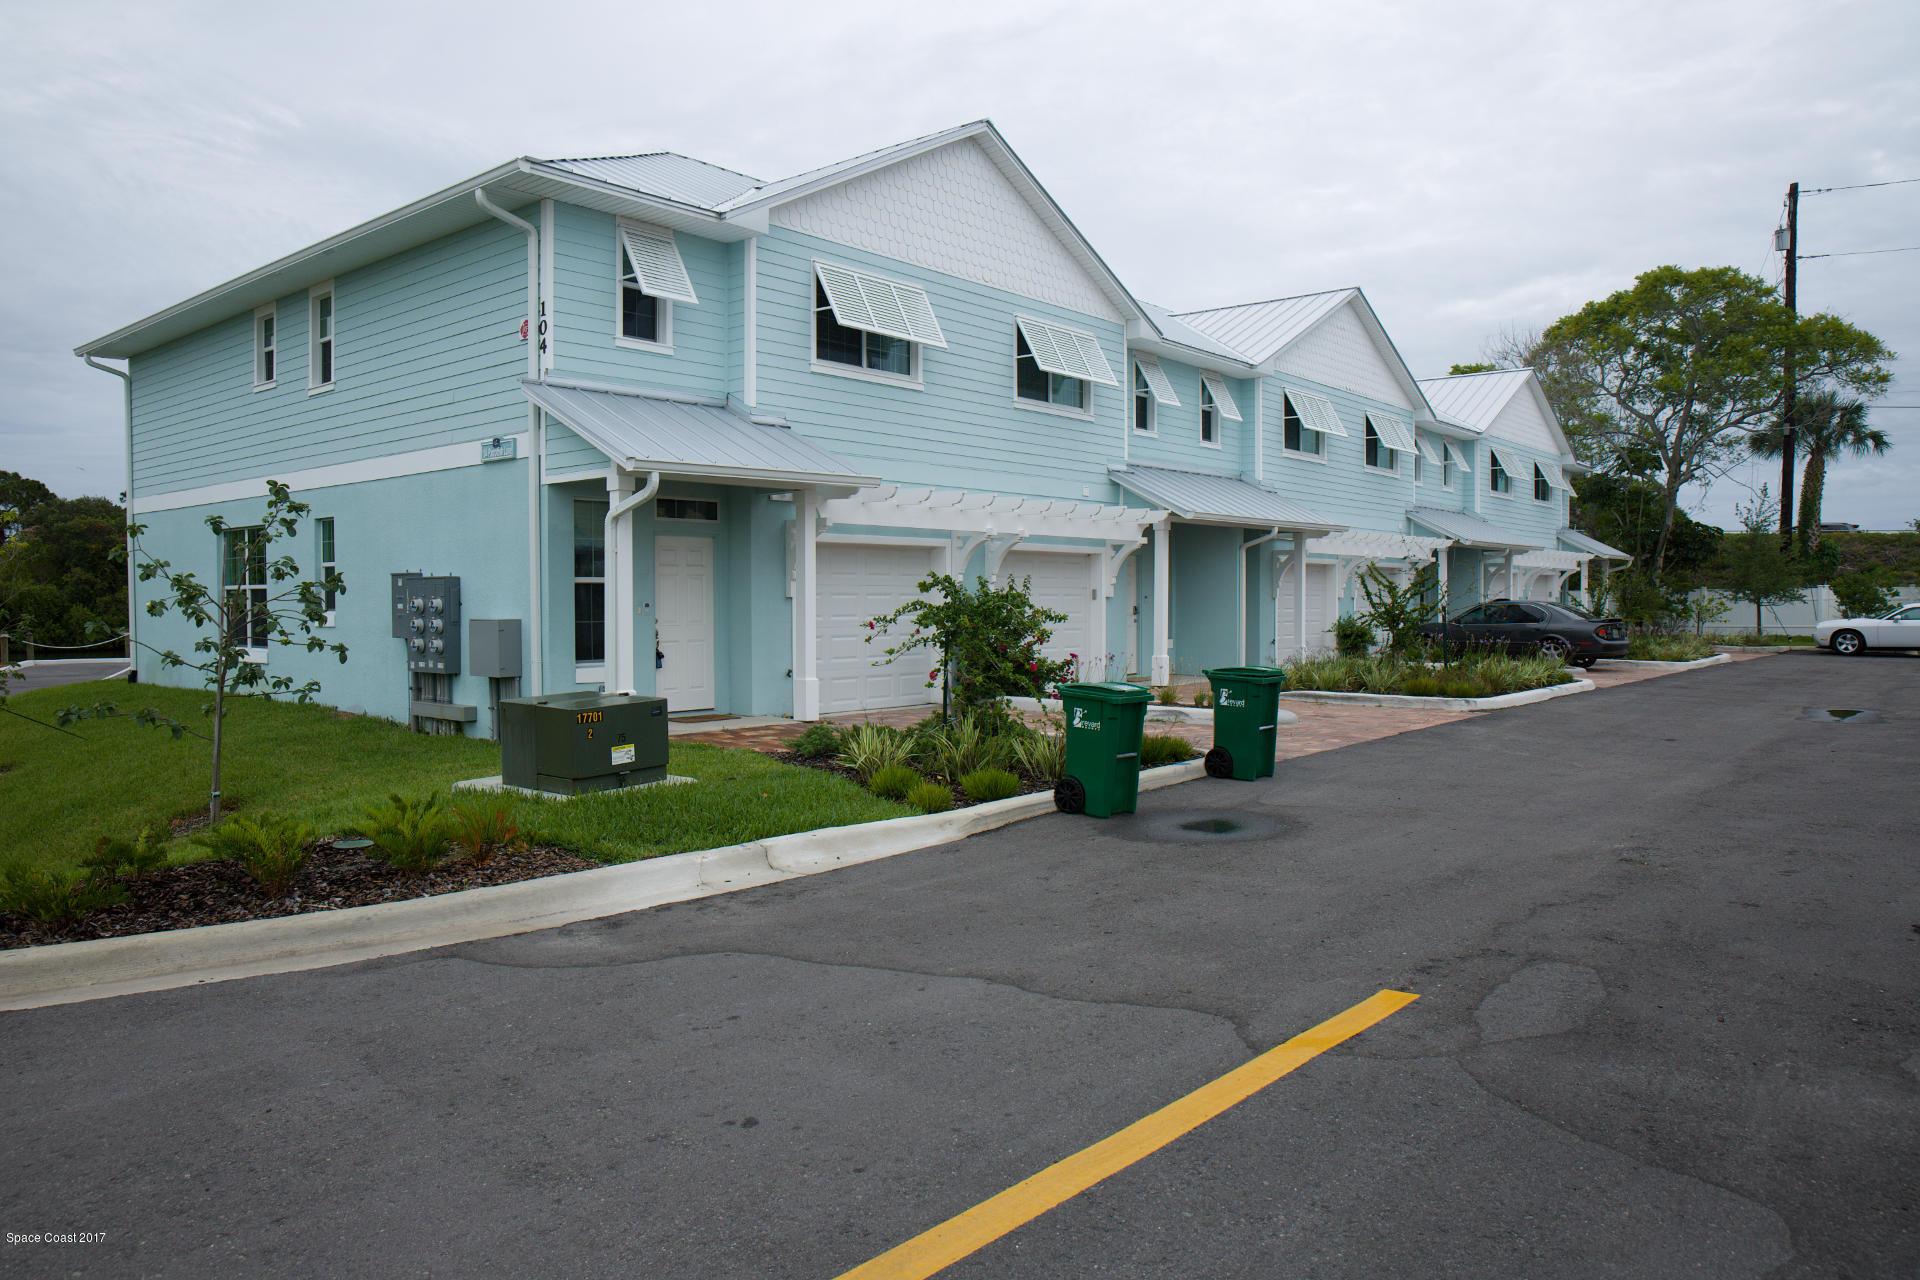 Single Family Home for Rent at 104 Parrotfish 104 Parrotfish Merritt Island, Florida 32953 United States